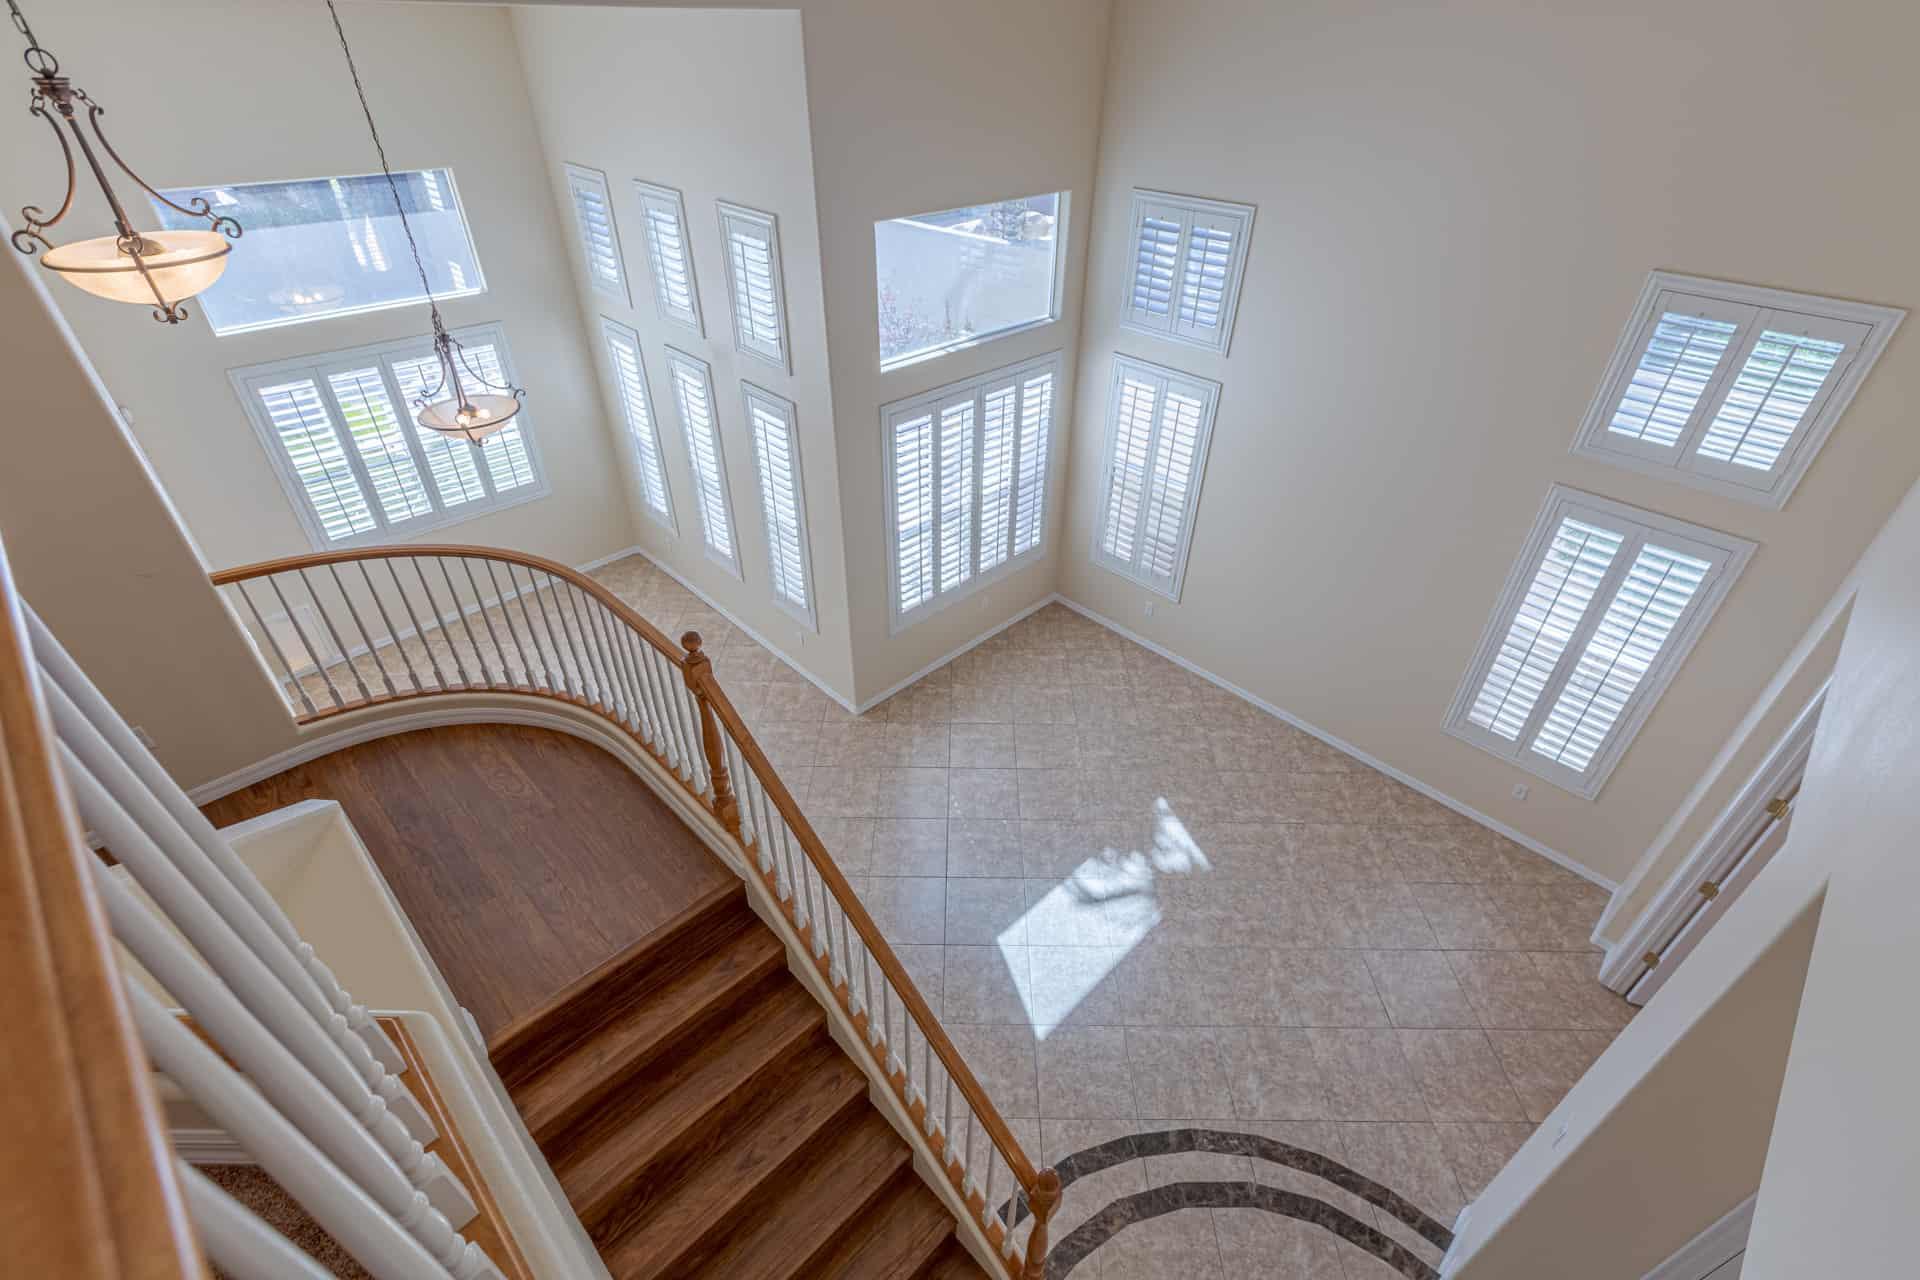 las-vegas-luxry-real-estate-realtor-rob-jensen-company-10729-grey-havens-court-willow-creek2857